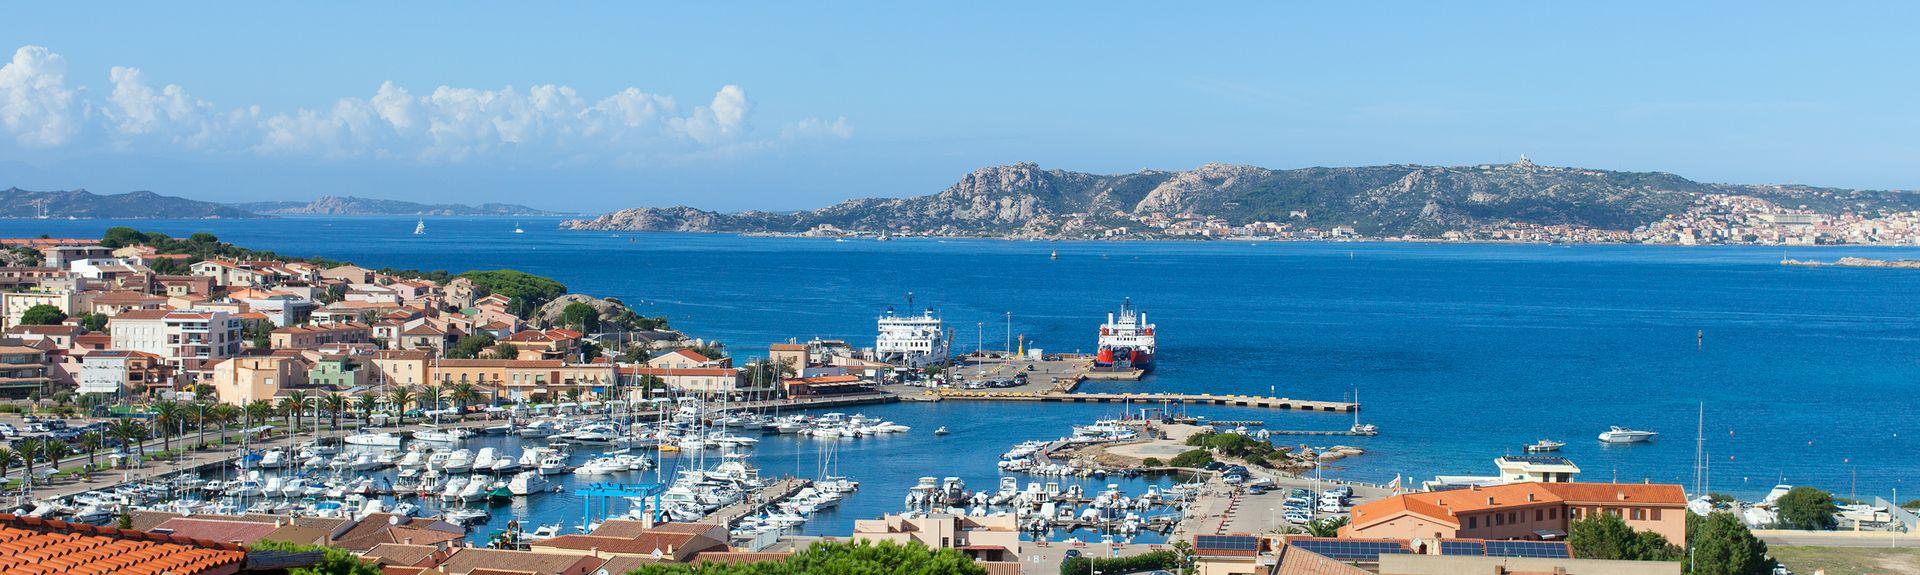 Palau, Sardinien, Italien